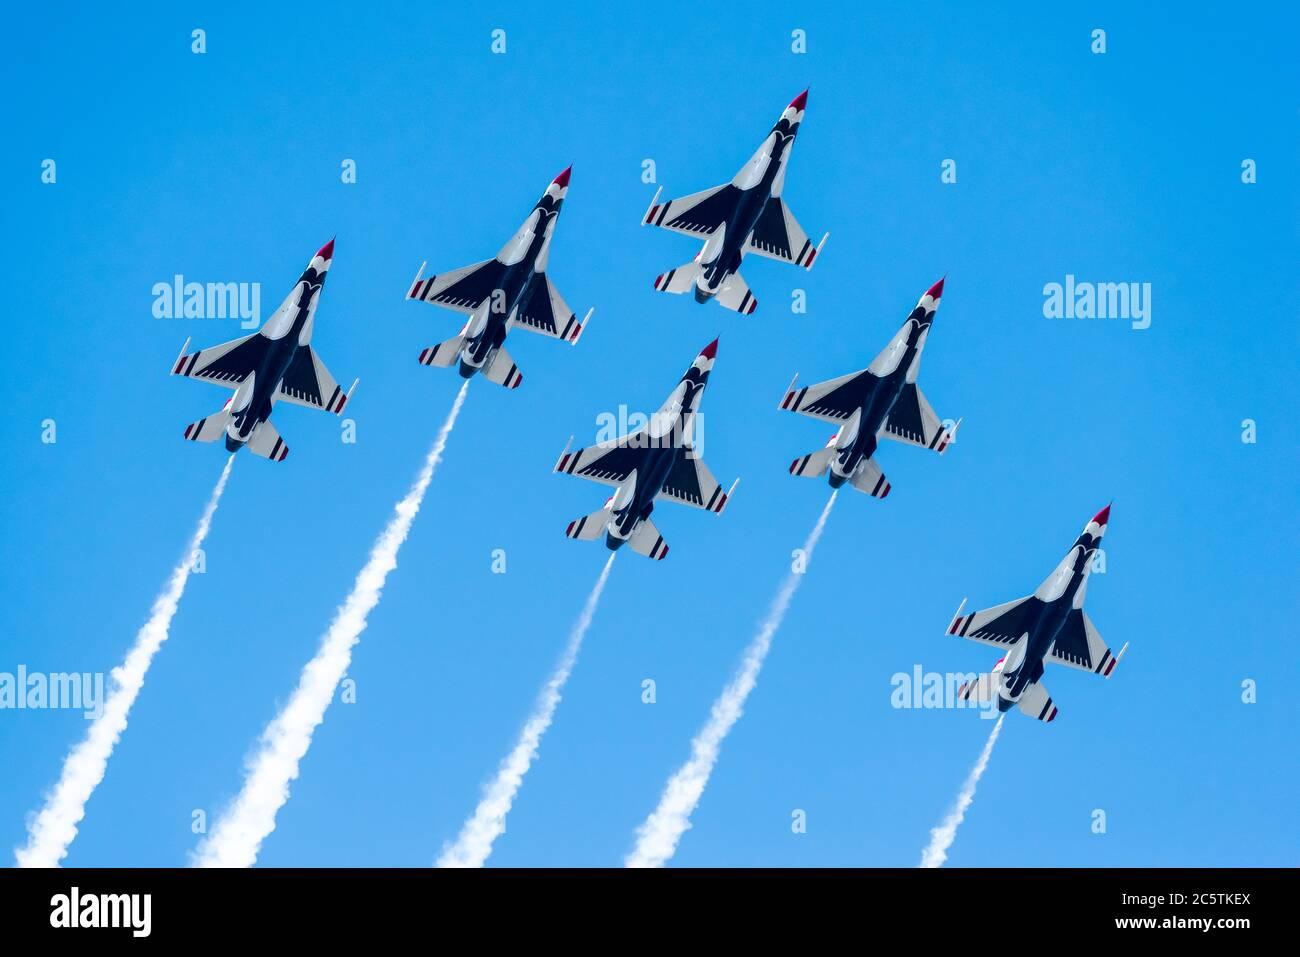 Boston, Massachusetts. 4 de julio de 2020. USAF aves acuáticas volando en el DOD Salute a América 2020 sobrevuelan. Foto de stock